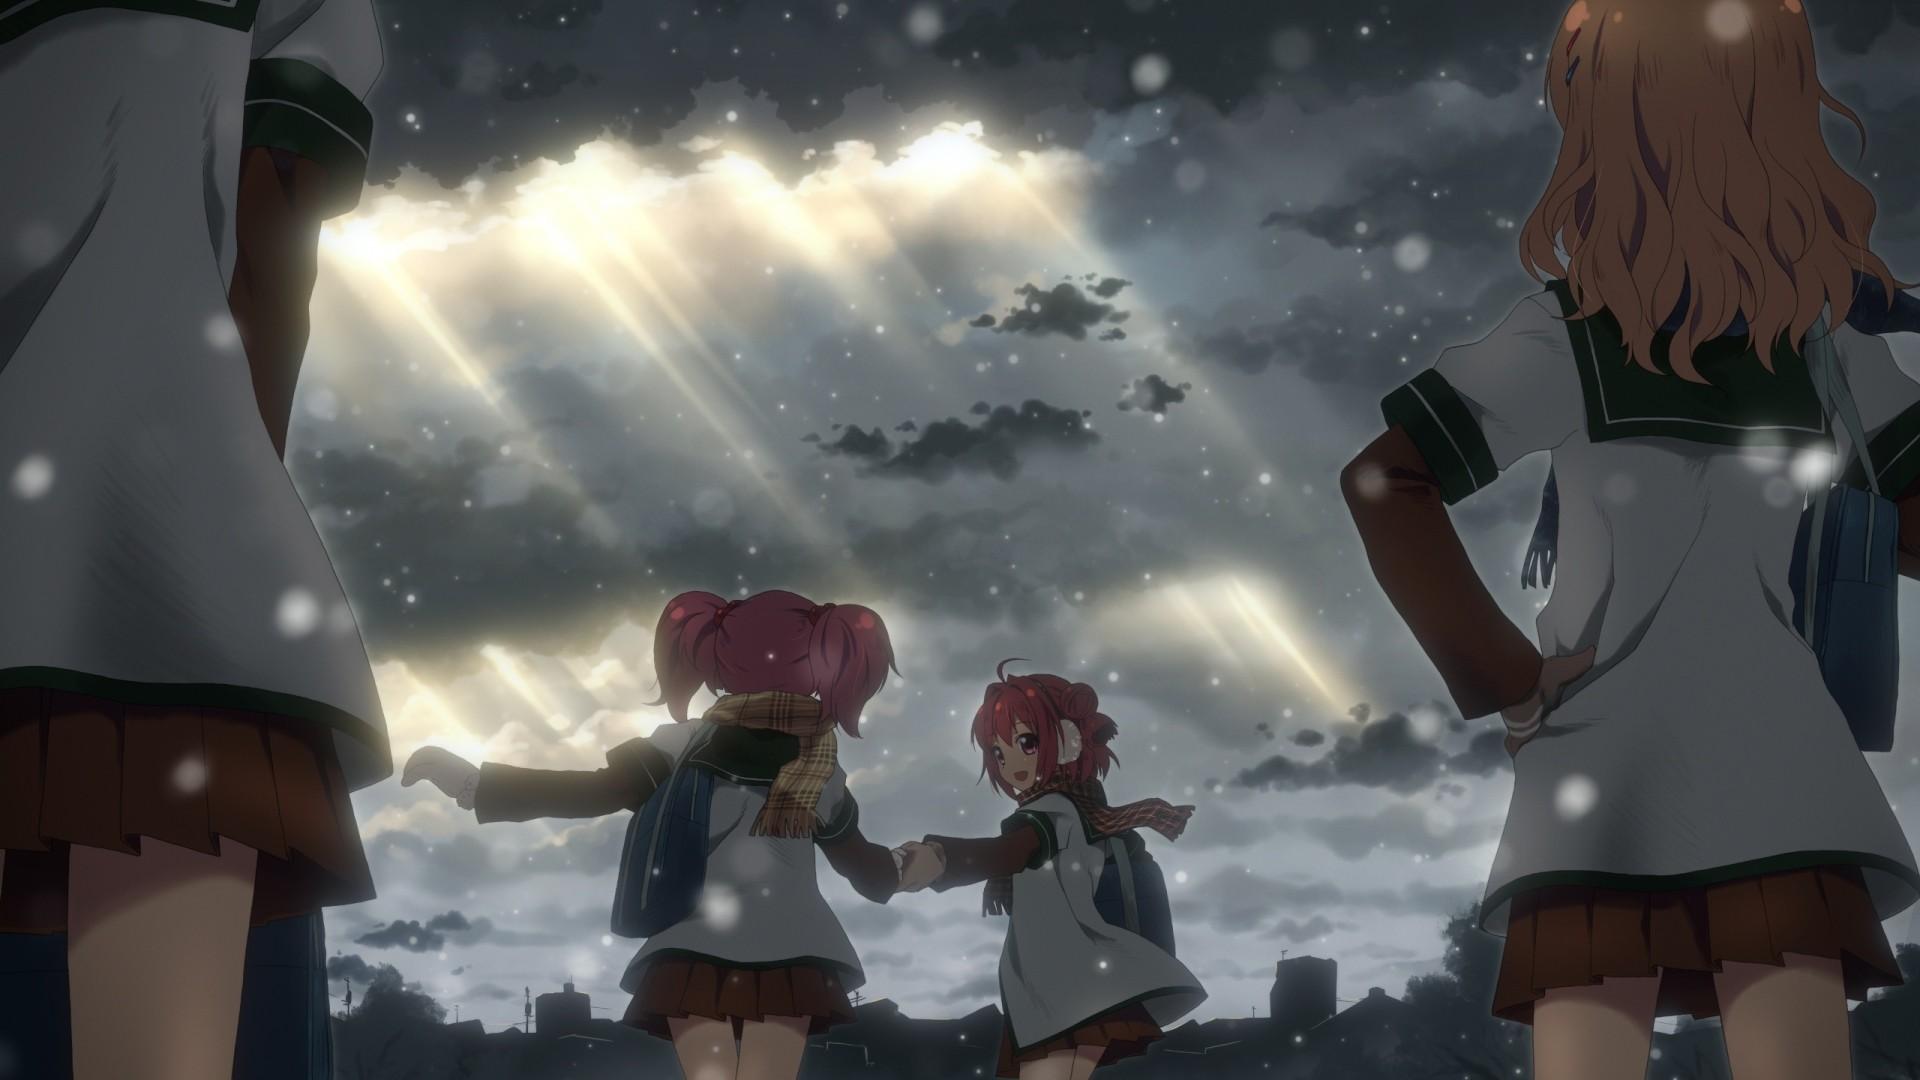 Wallpaper yuru yuri, girls, anime